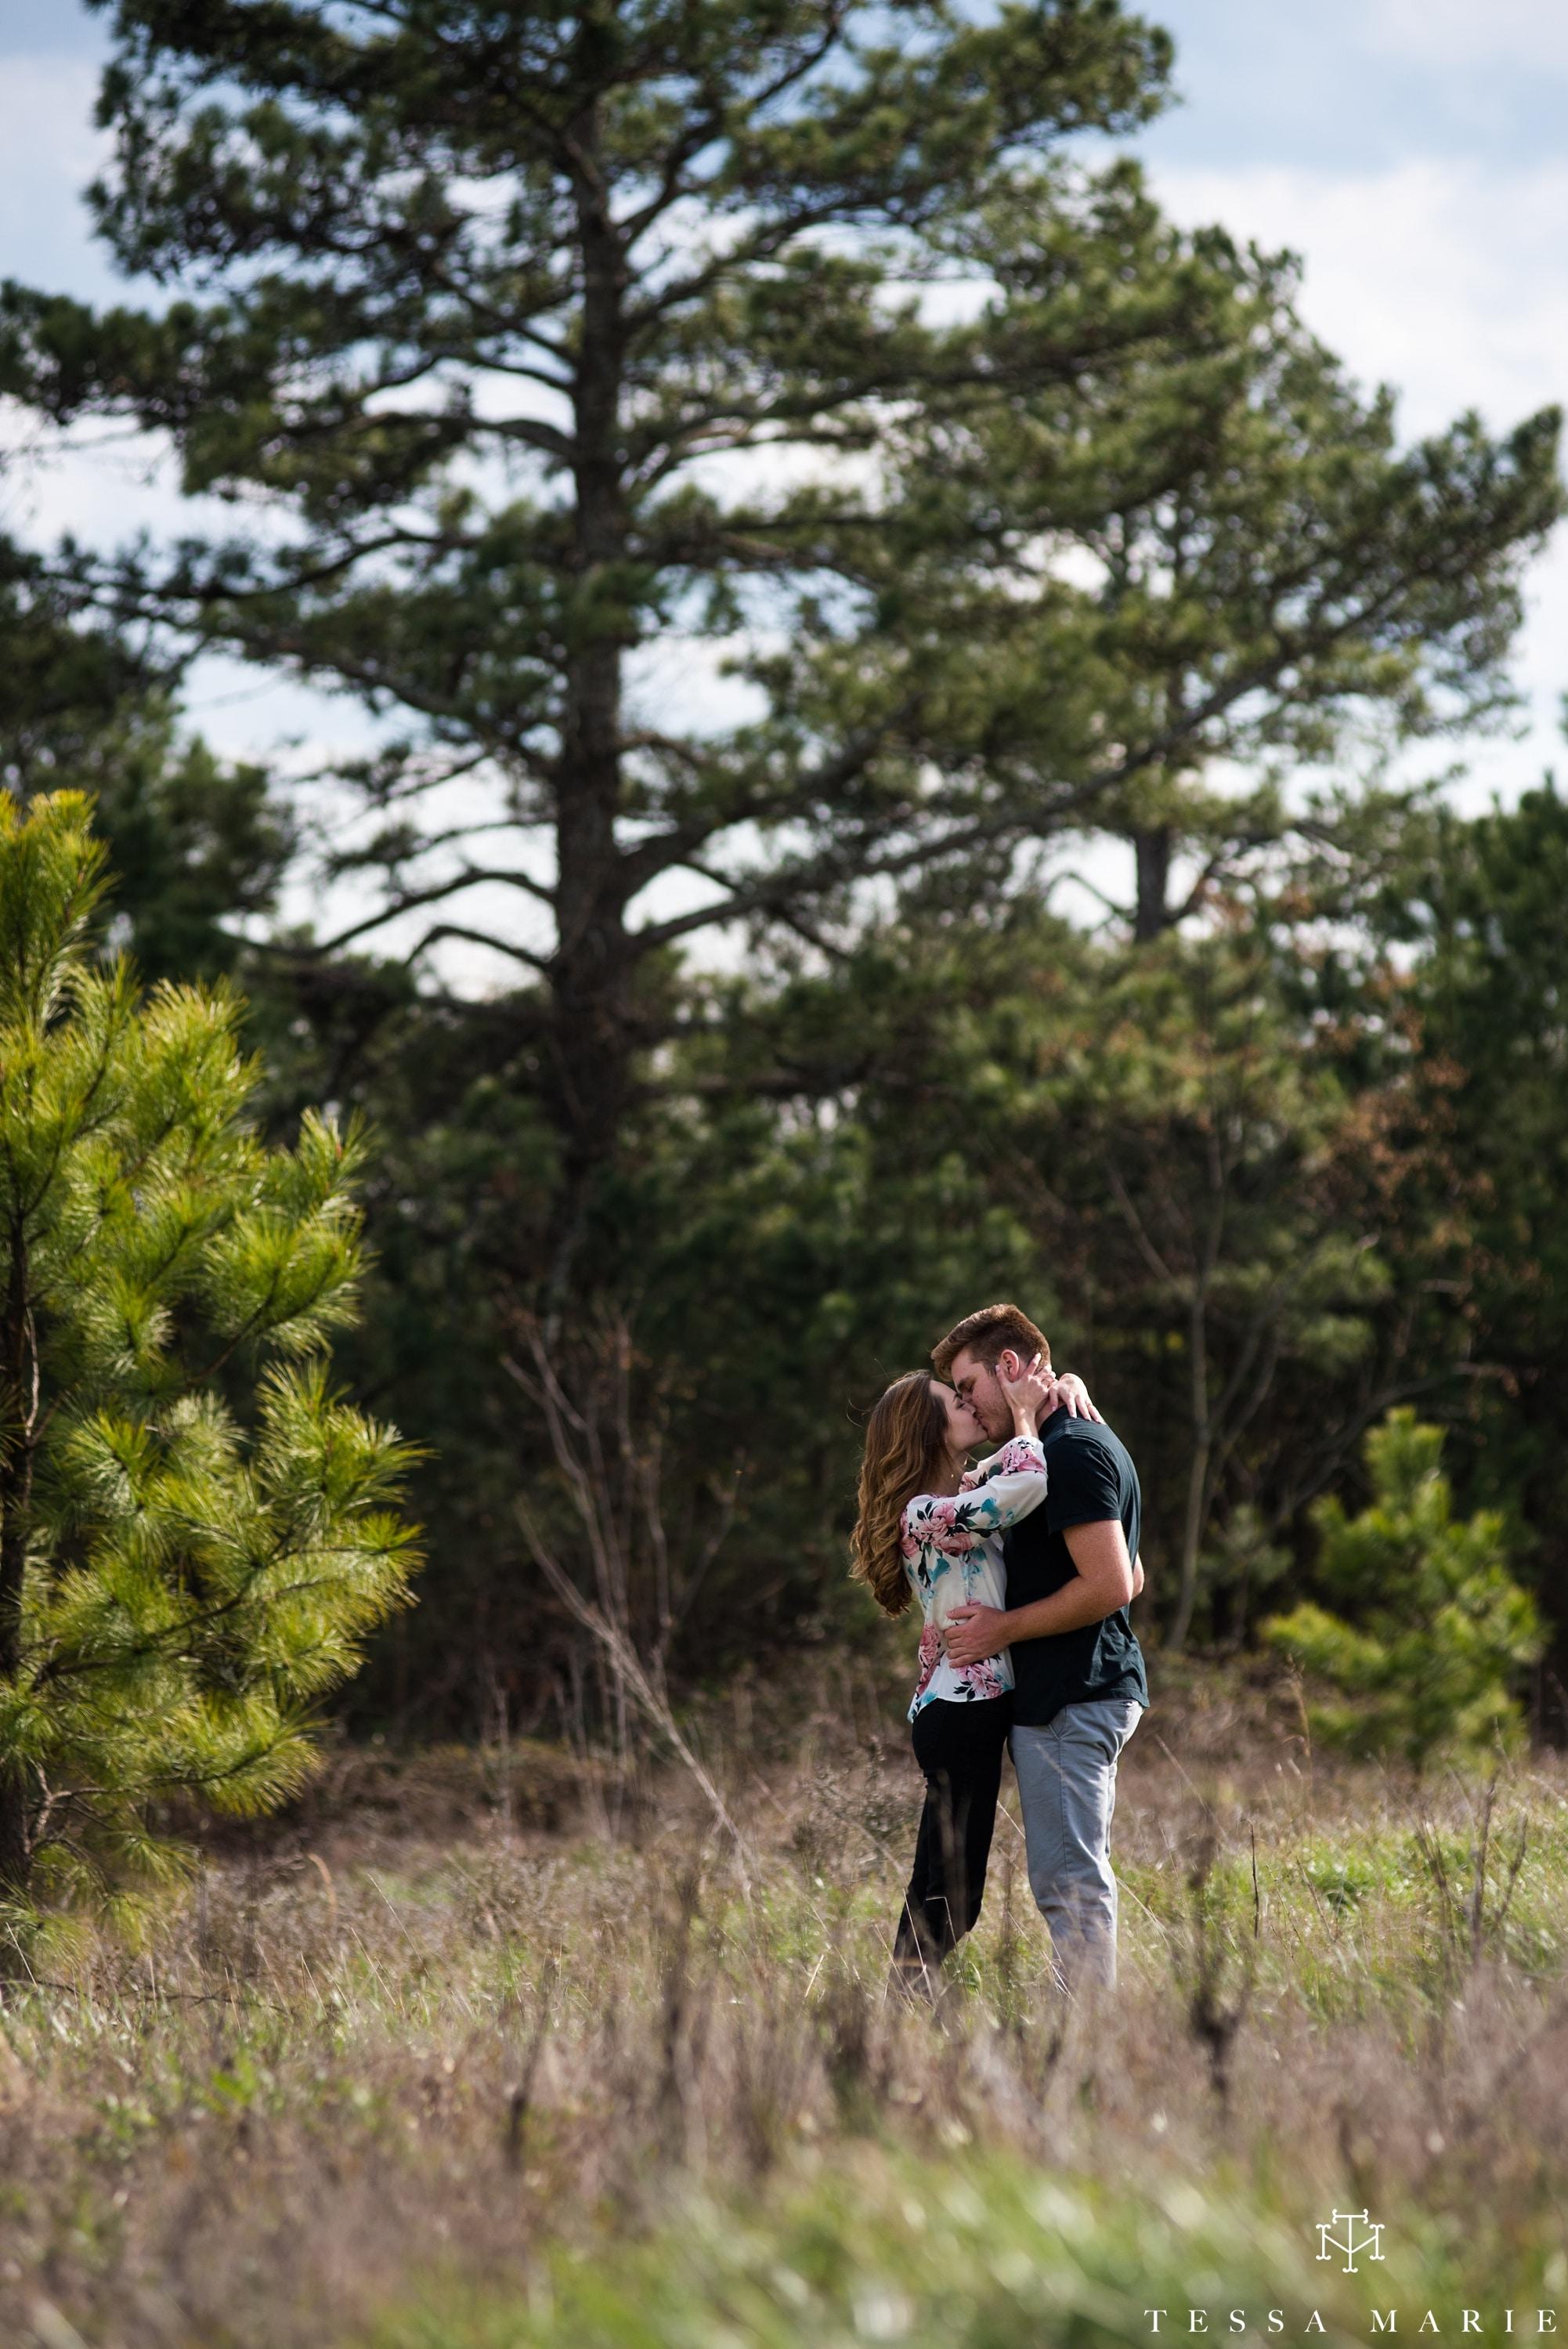 tessa_marie_studios_tessa_marie_weddings_proposal_atlanta_engagement_pictures_0064